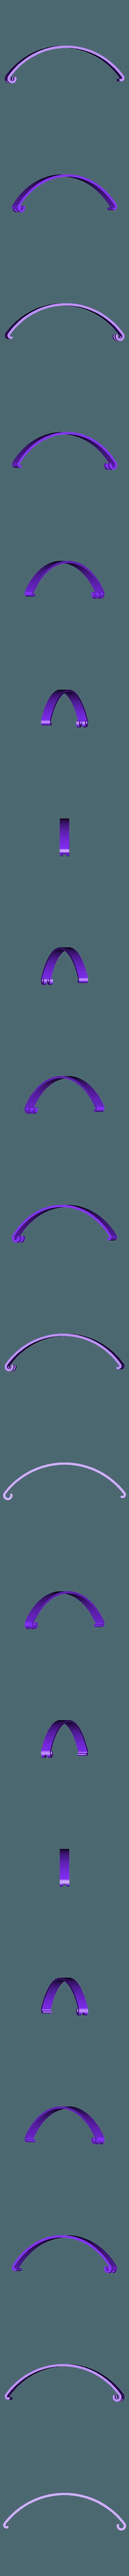 bag_clip_100mm_outside.stl Download free SCAD file Customizable Bag Clip • 3D printable design, WalterHsiao